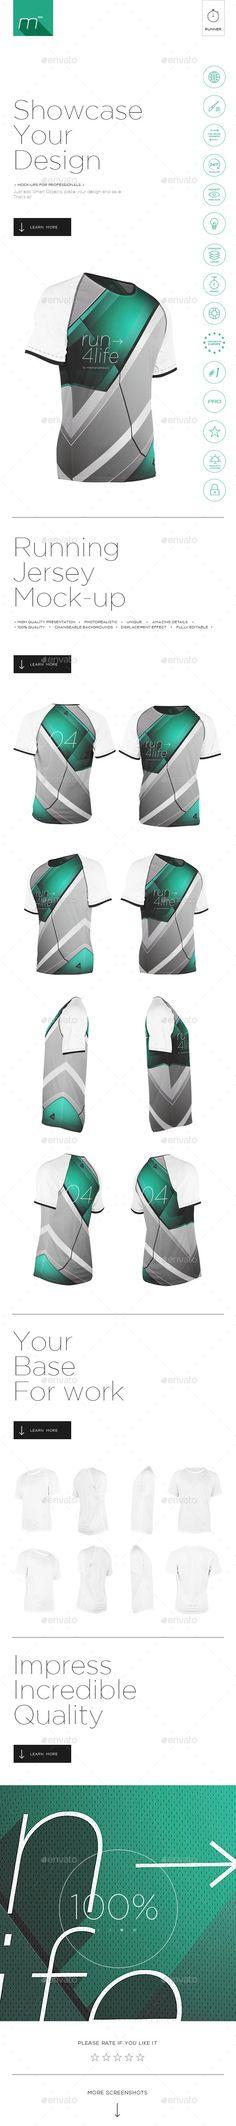 Running Jersey Mock-up #design Download: http://graphicriver.net/item/running-jersey-mockup/11650503?ref=ksioks